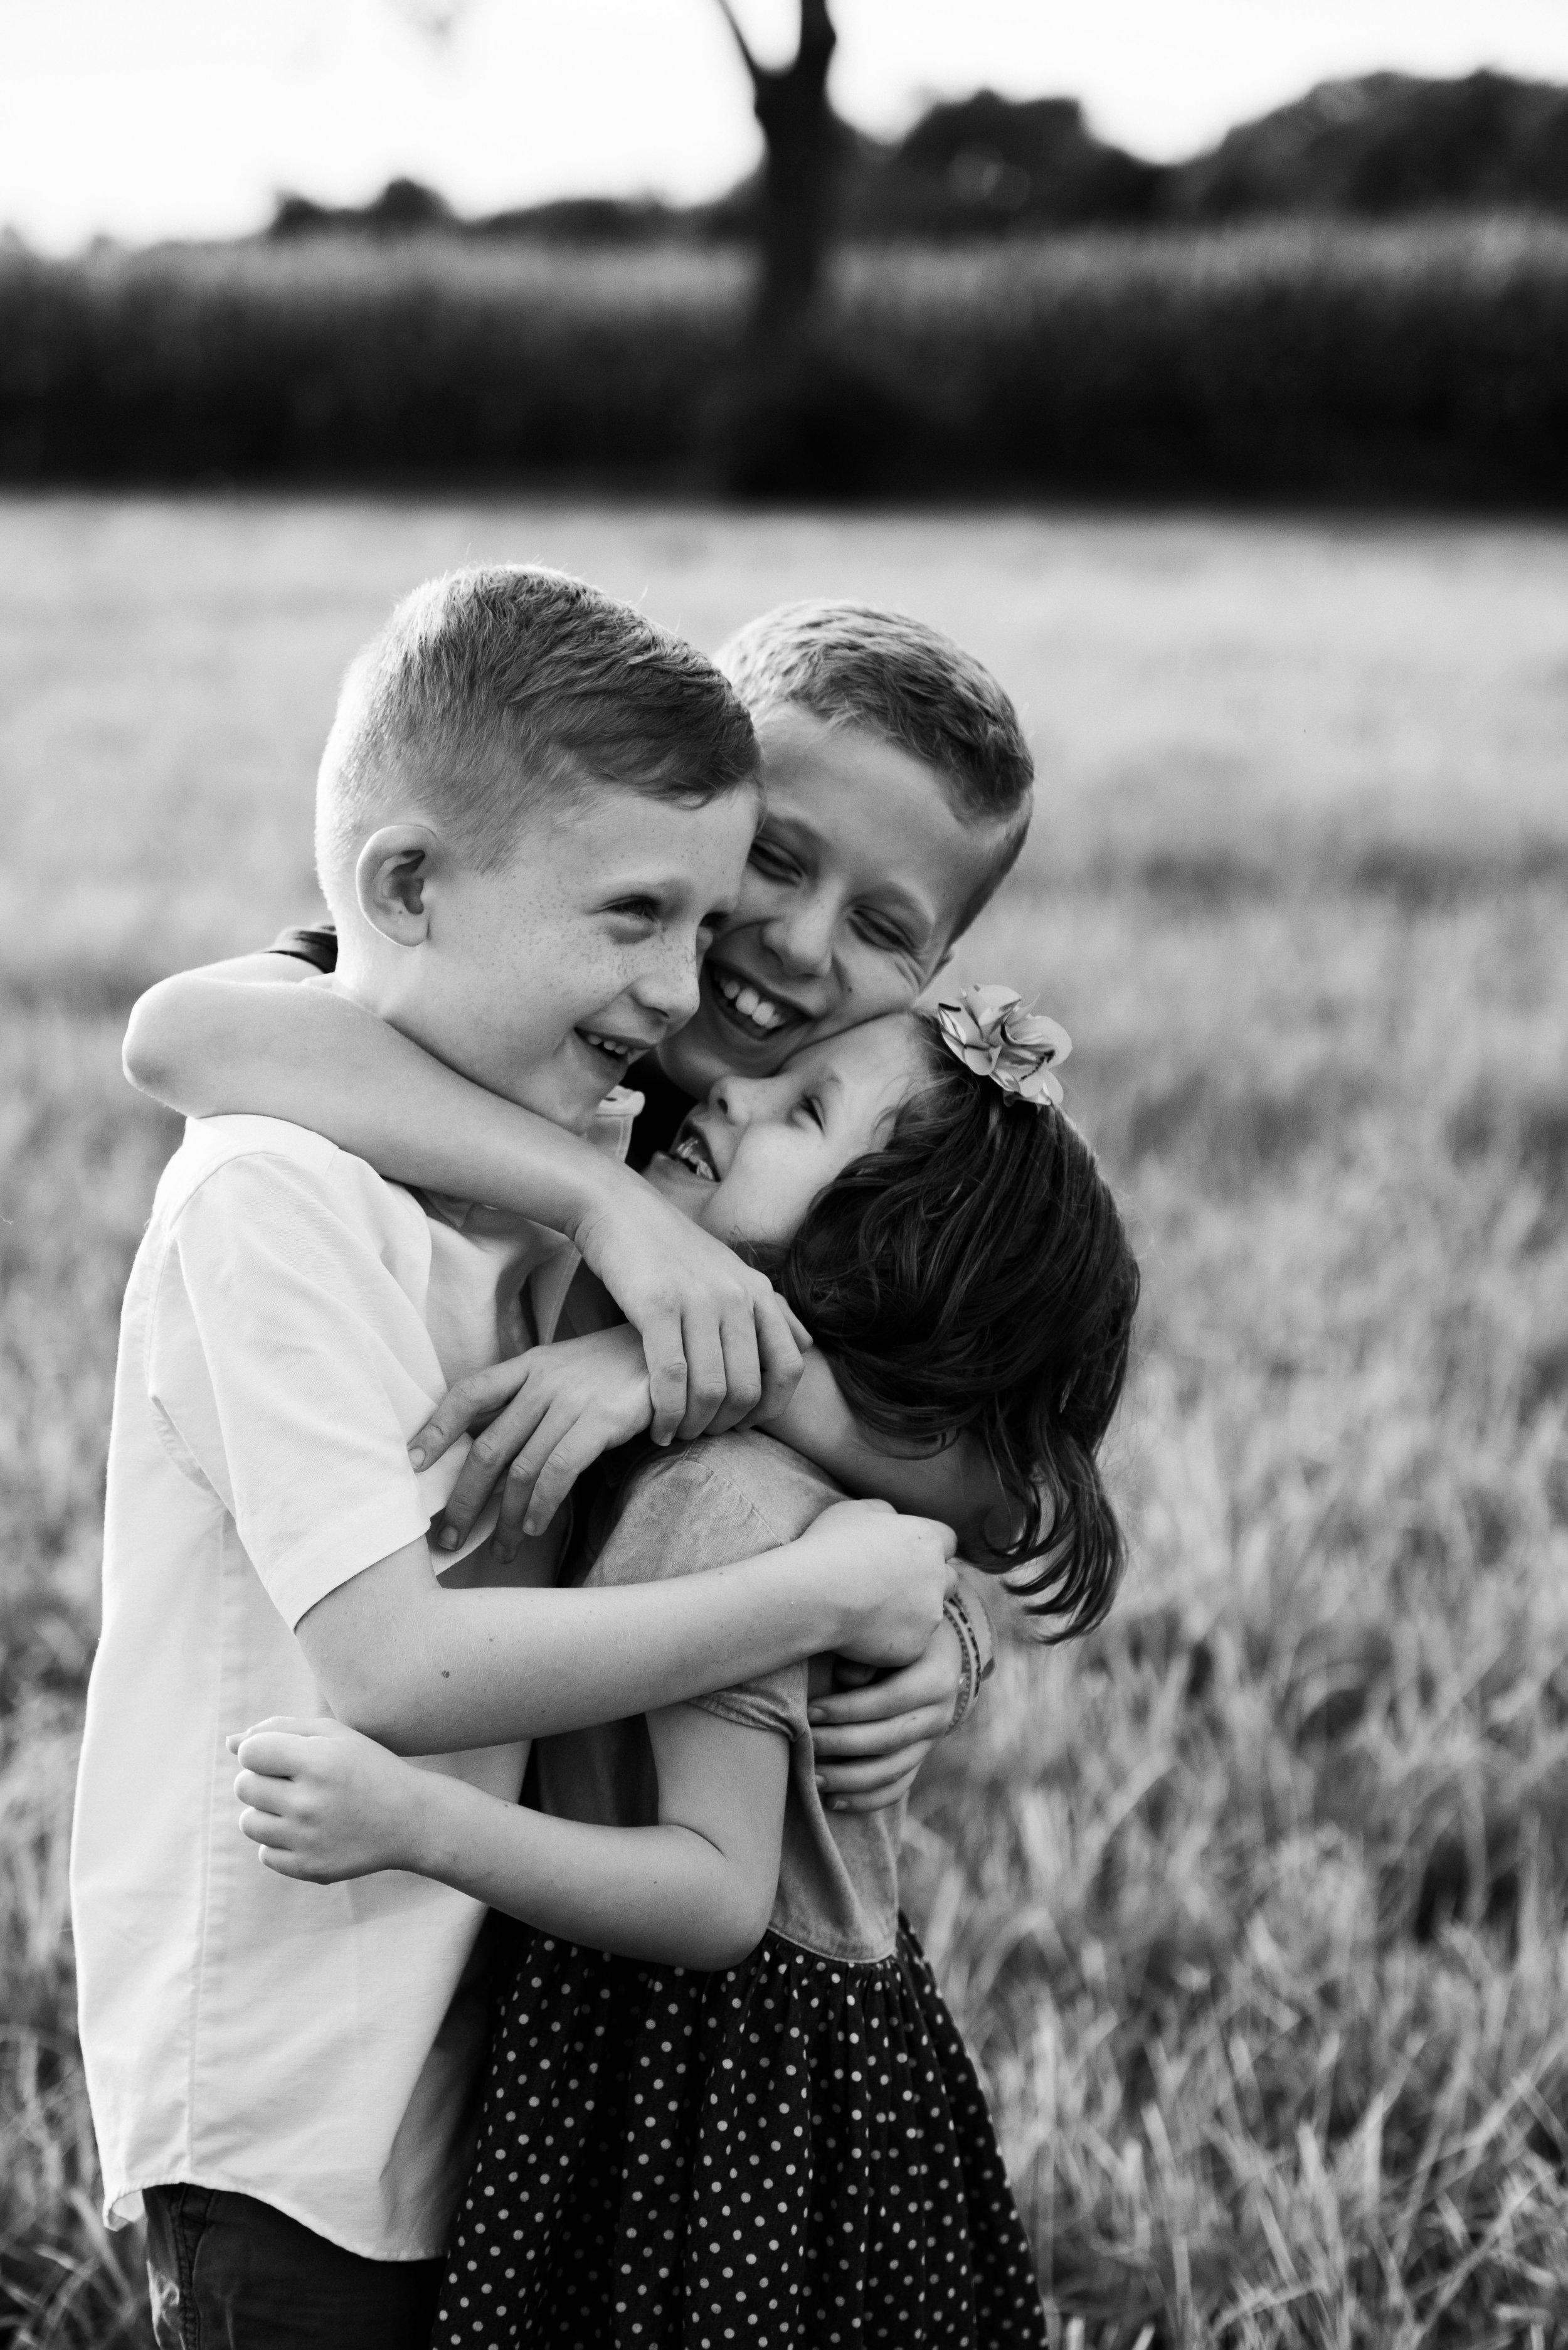 kids hugging each other in bw-4838.jpg